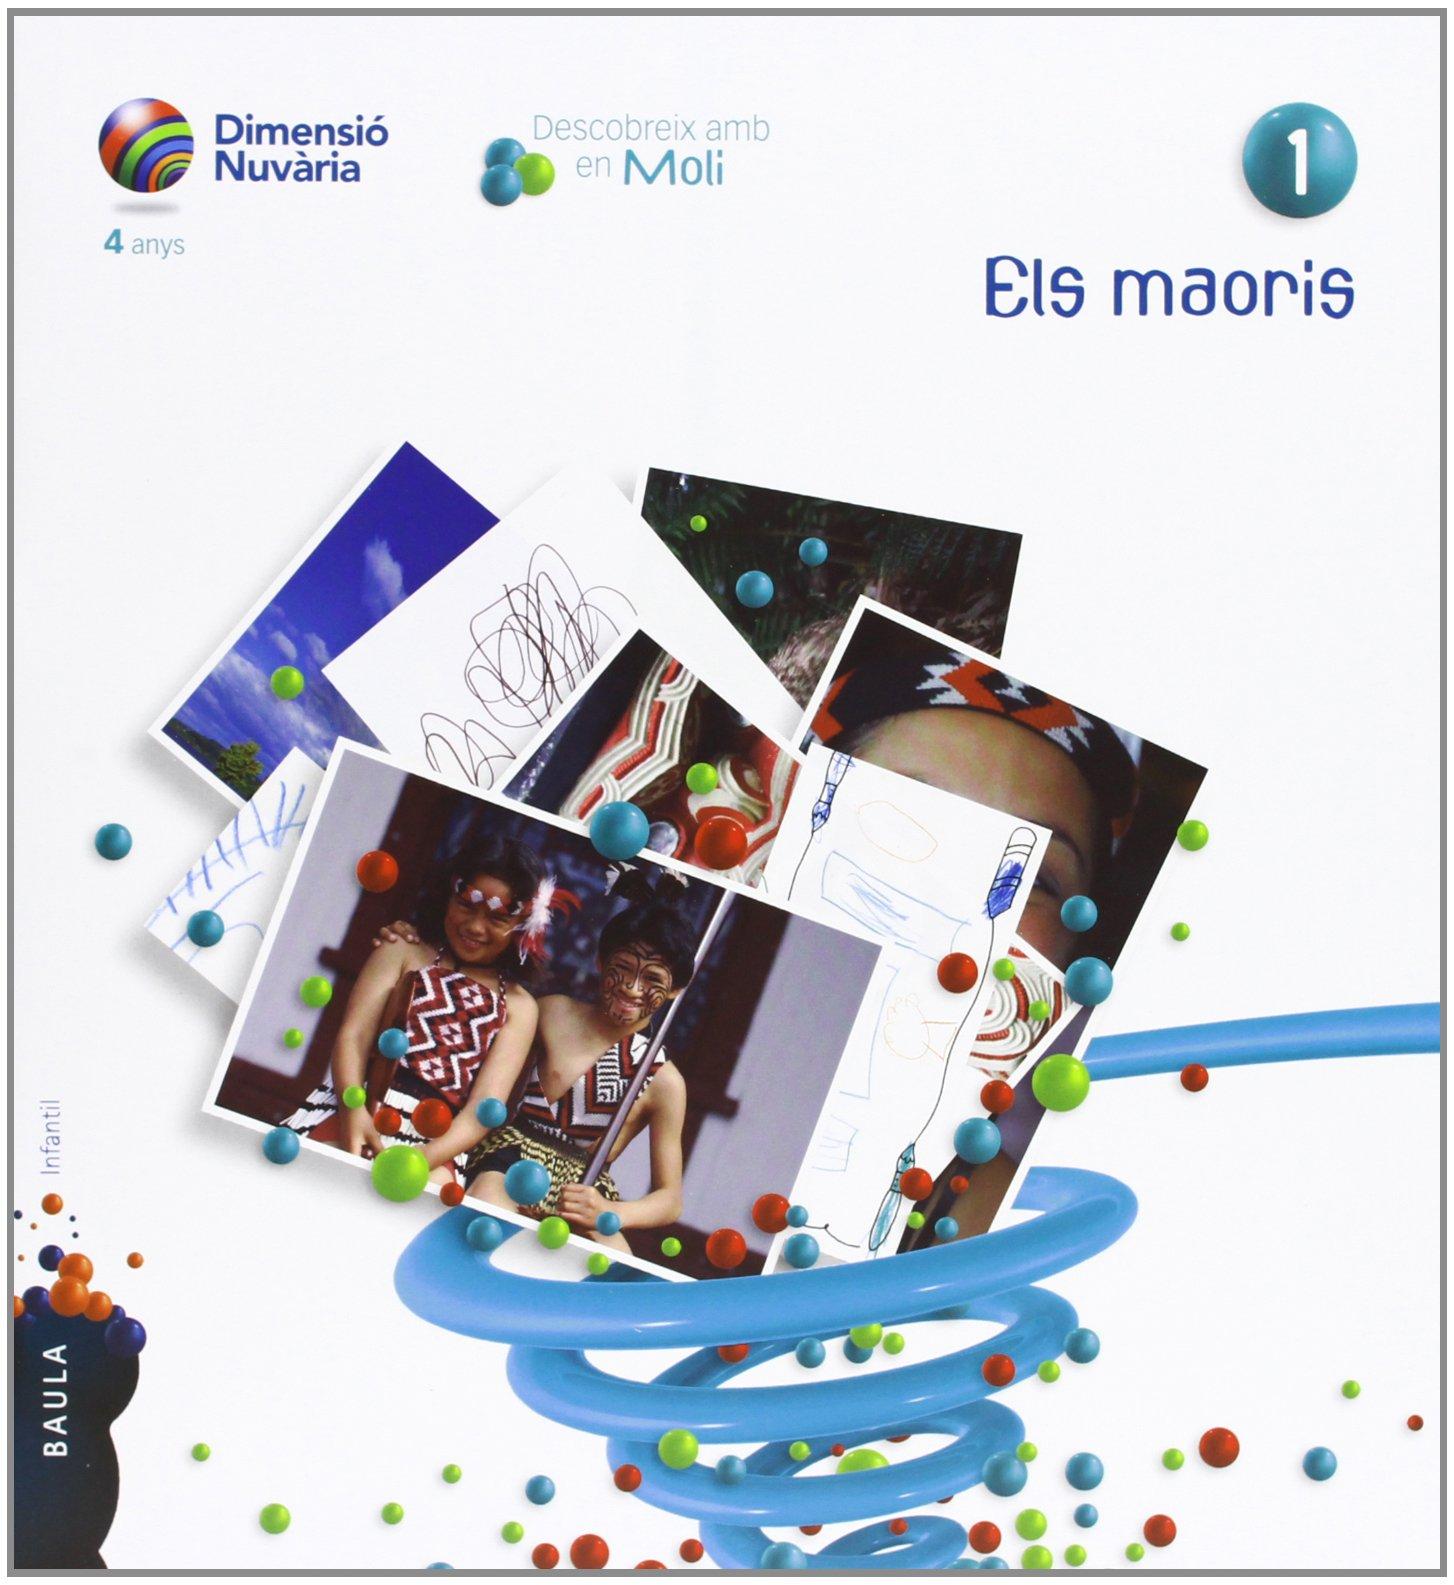 Moli Infantil 4 anys Carpeta 1r trimestre Dimensió Nuvària Projecte Dimensió Nuvària - 9788447926183: Amazon.es: Manuela Corrales Peral, Rosa María Corrales ...